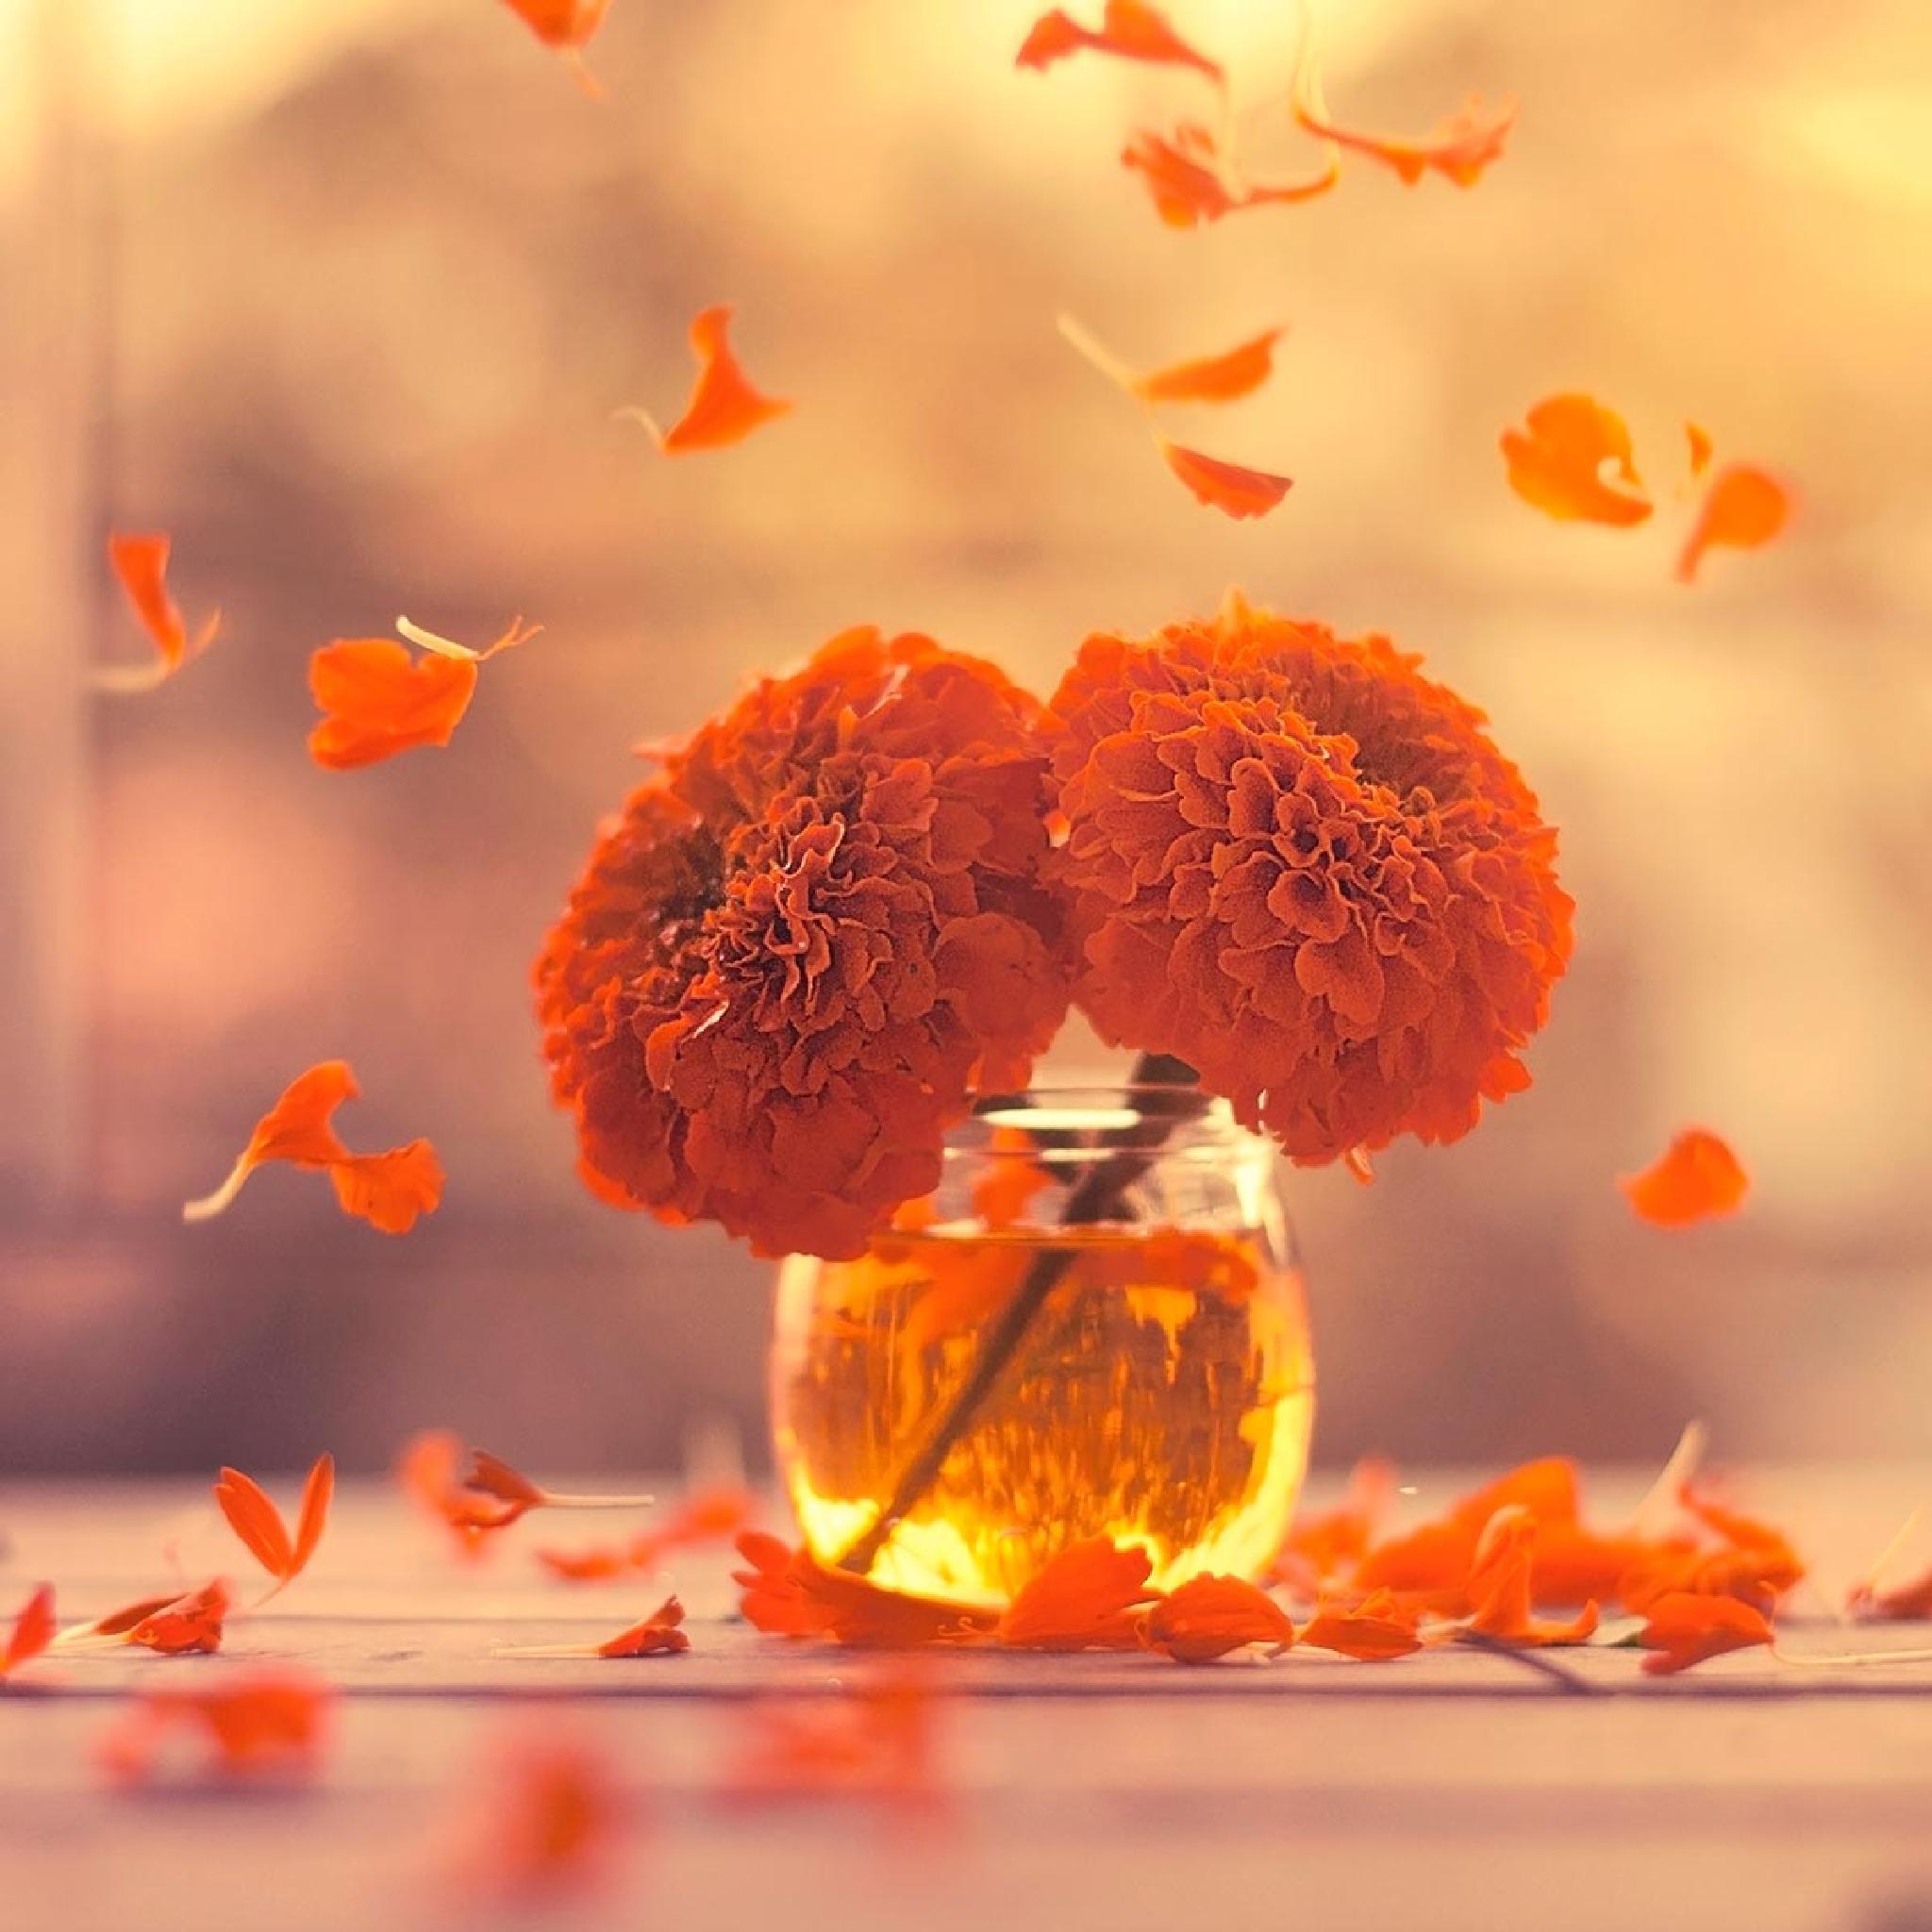 Marigold days by Ashraful Arefin